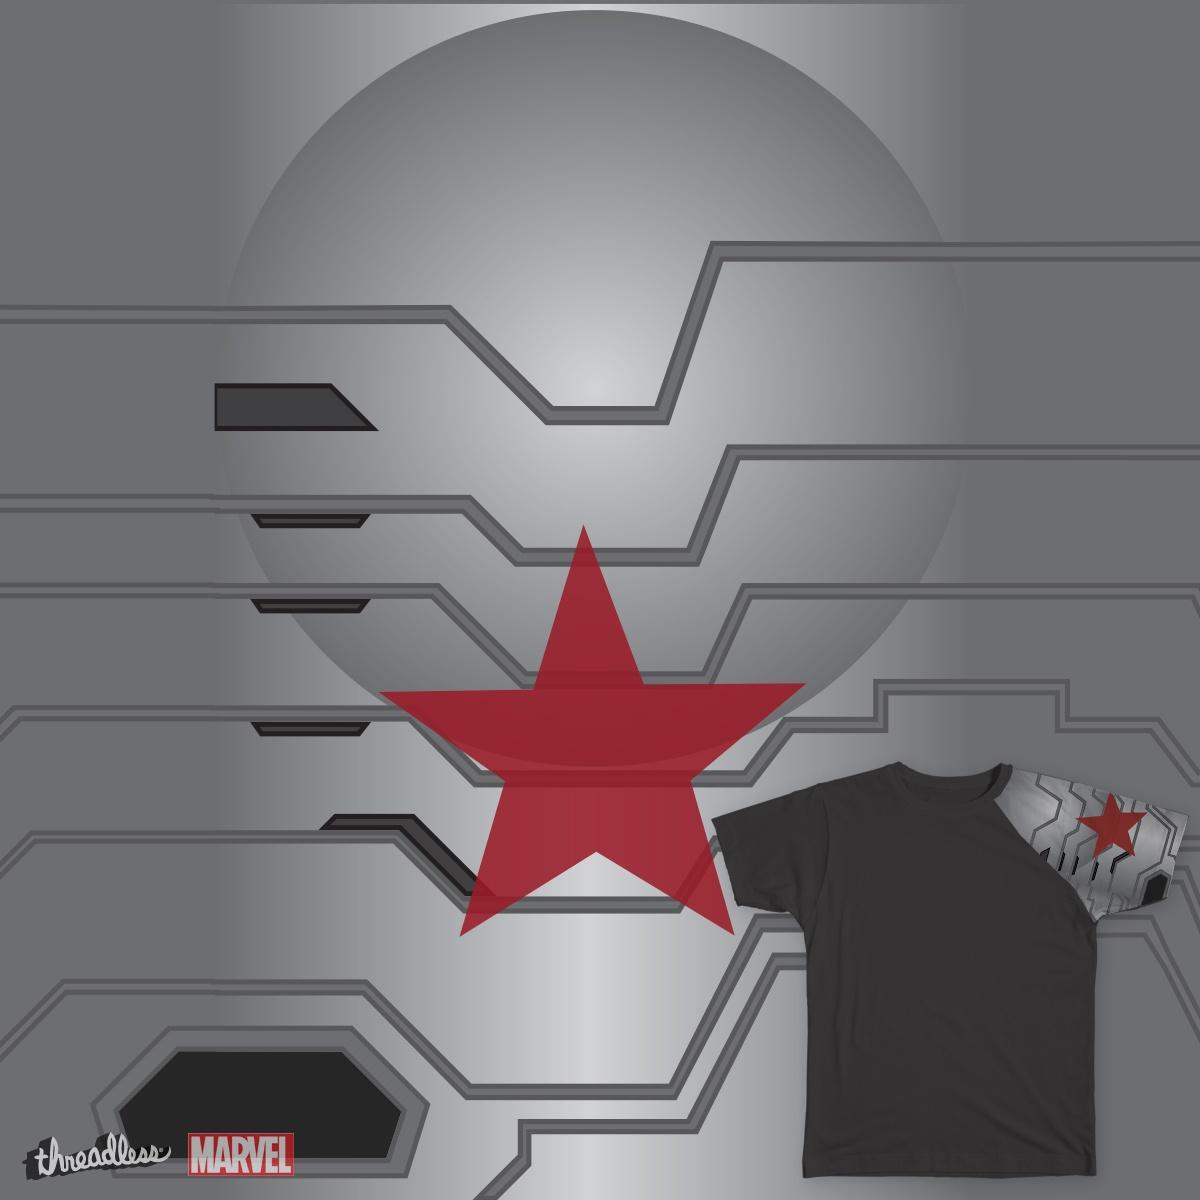 Score Winter Soldier Arm by Katarnar on Threadless